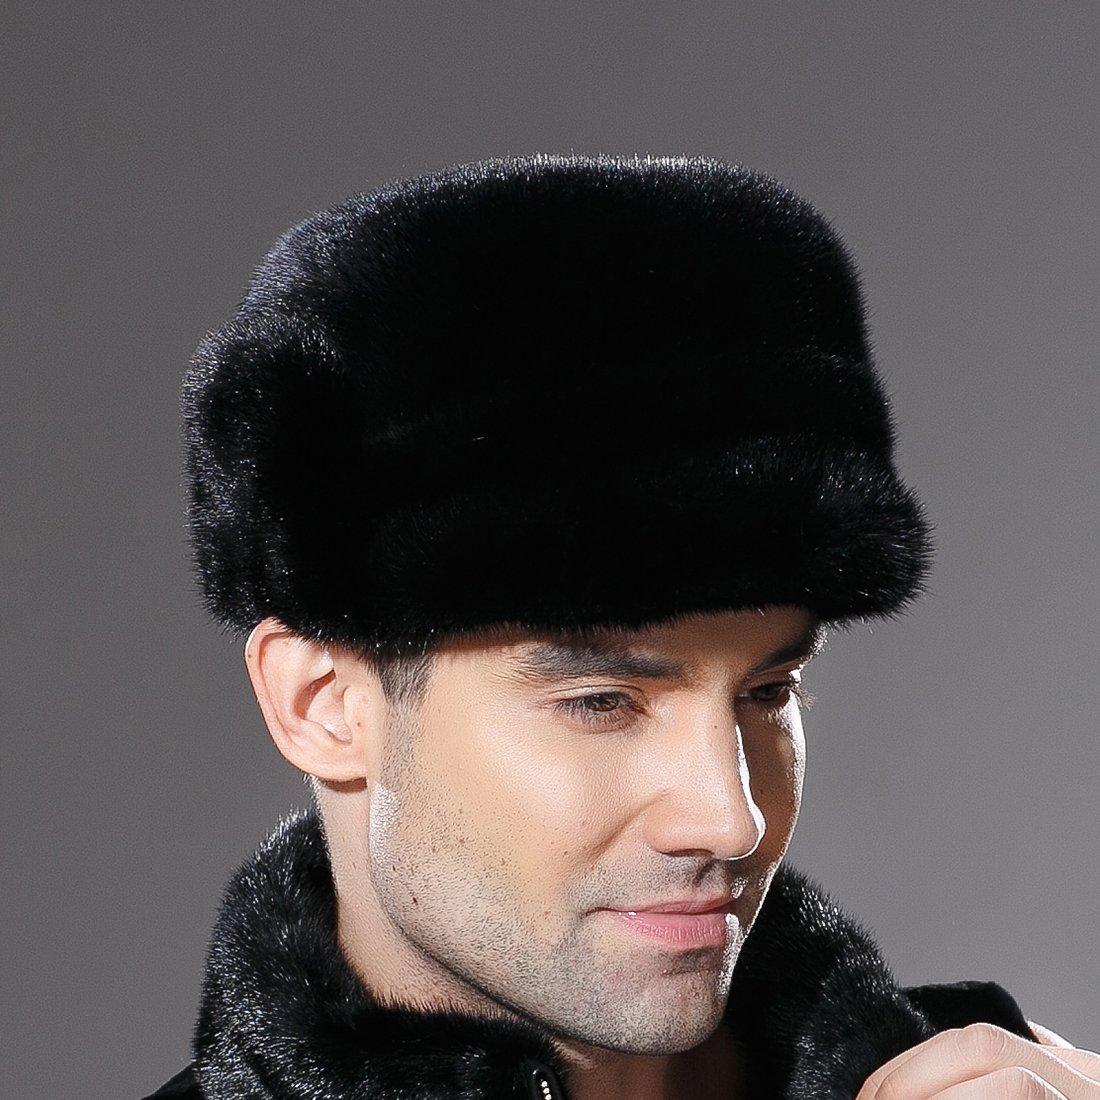 URSFUR Mne's Winter Fur Cap Genuine Mink Fur Fudd Hat Black M by URSFUR (Image #5)